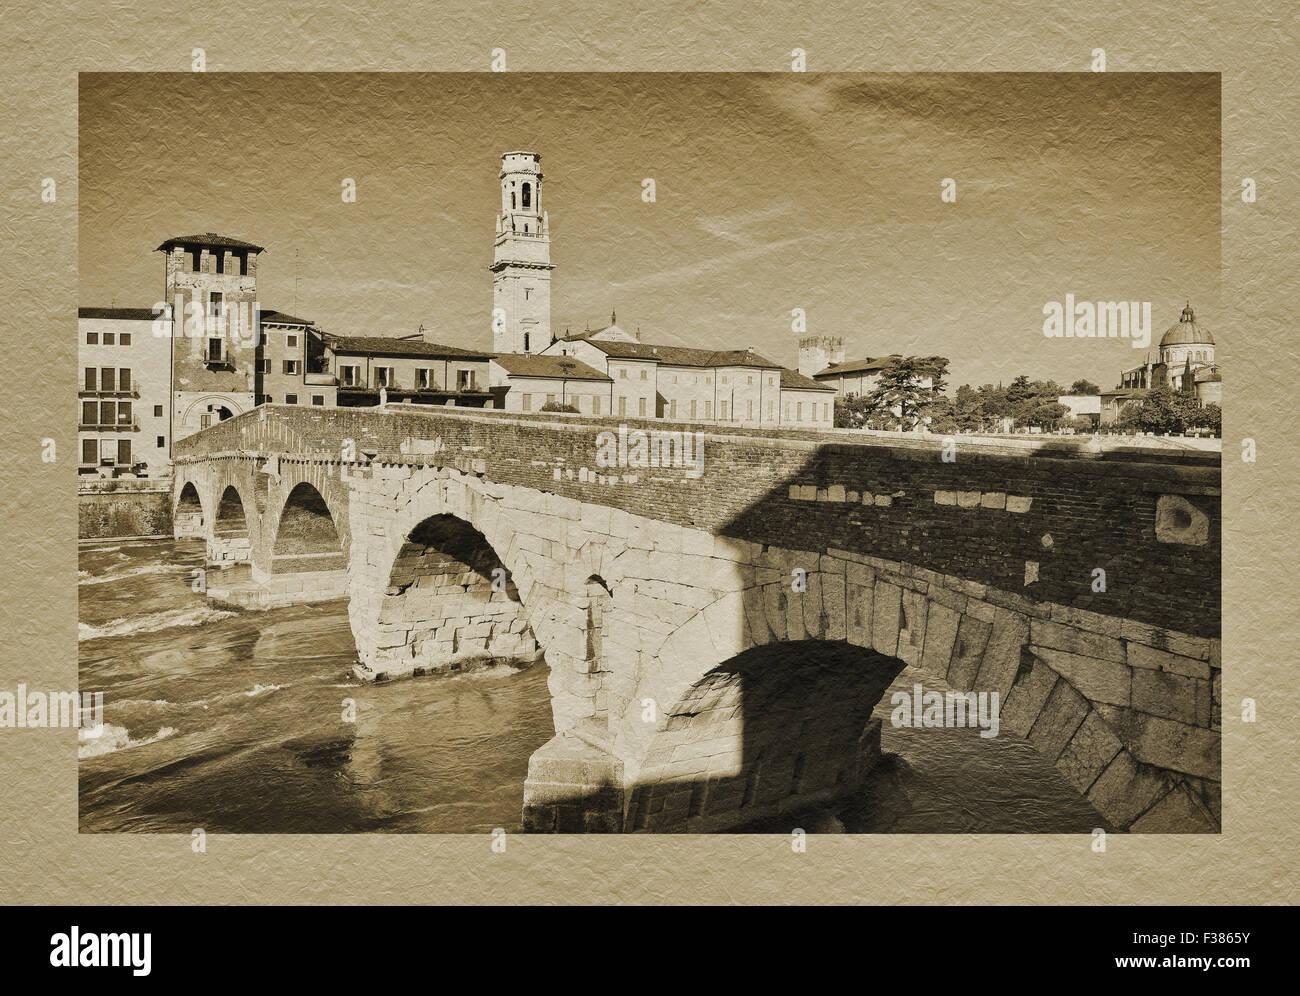 View over the Adige river to old town, Ponte Pietra, San Giorgio in Braida and Santa Maria Matricolare, Verona, Stock Photo